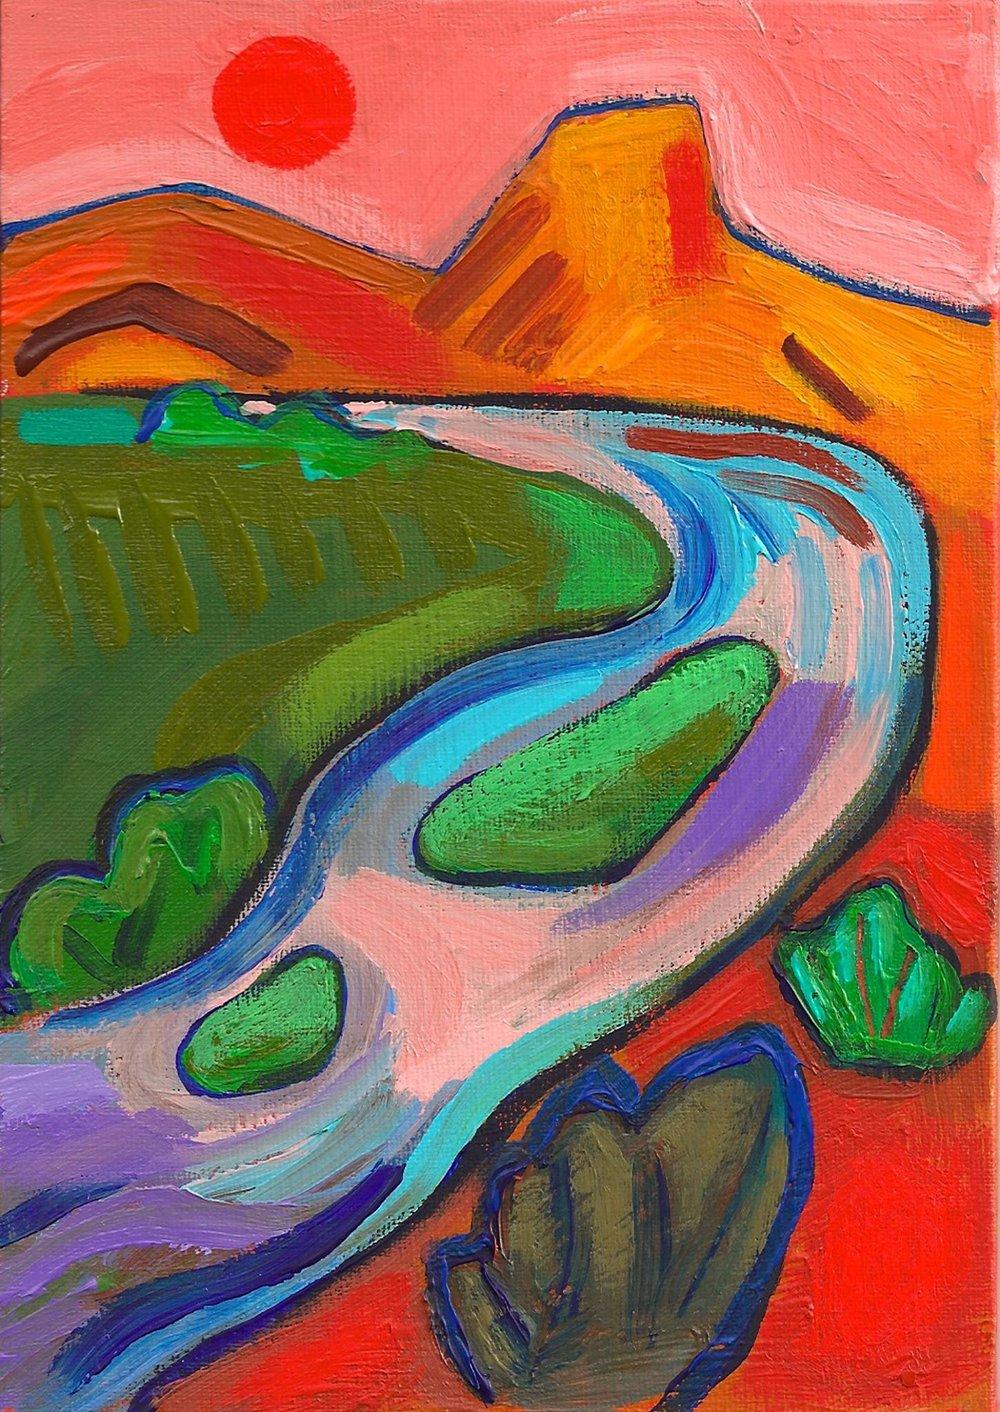 - Copper Mountain (15x30) $600